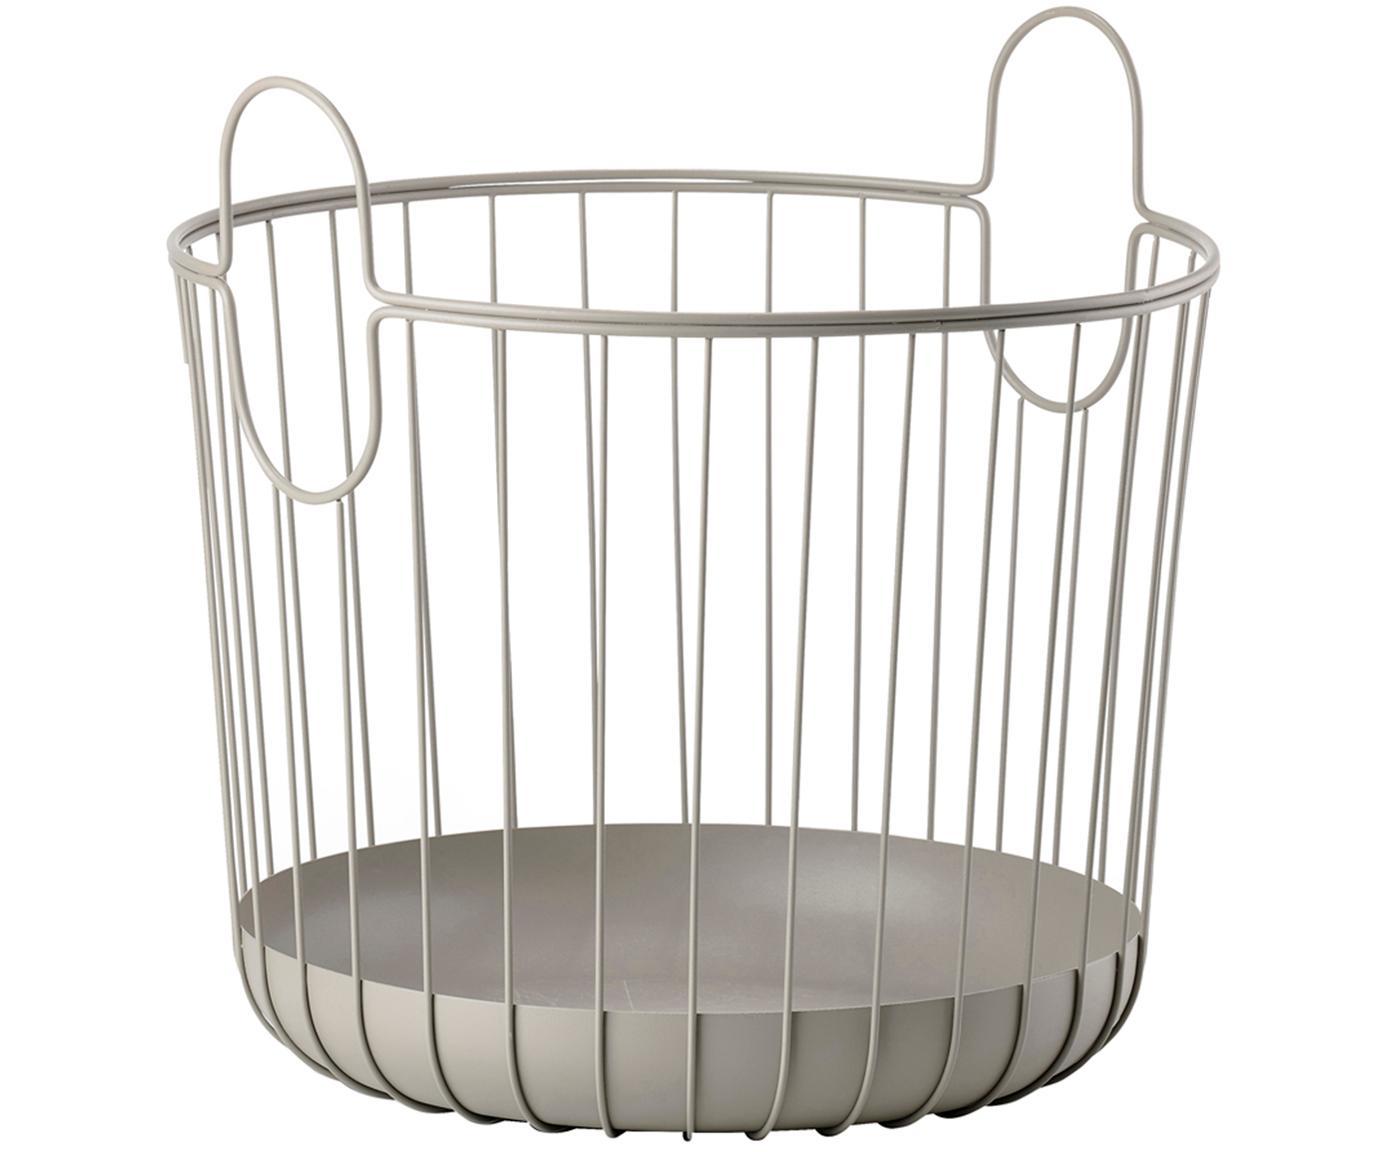 Cesto Ina, Metallo, Marrone, Ø 30 x Alt. 31 cm